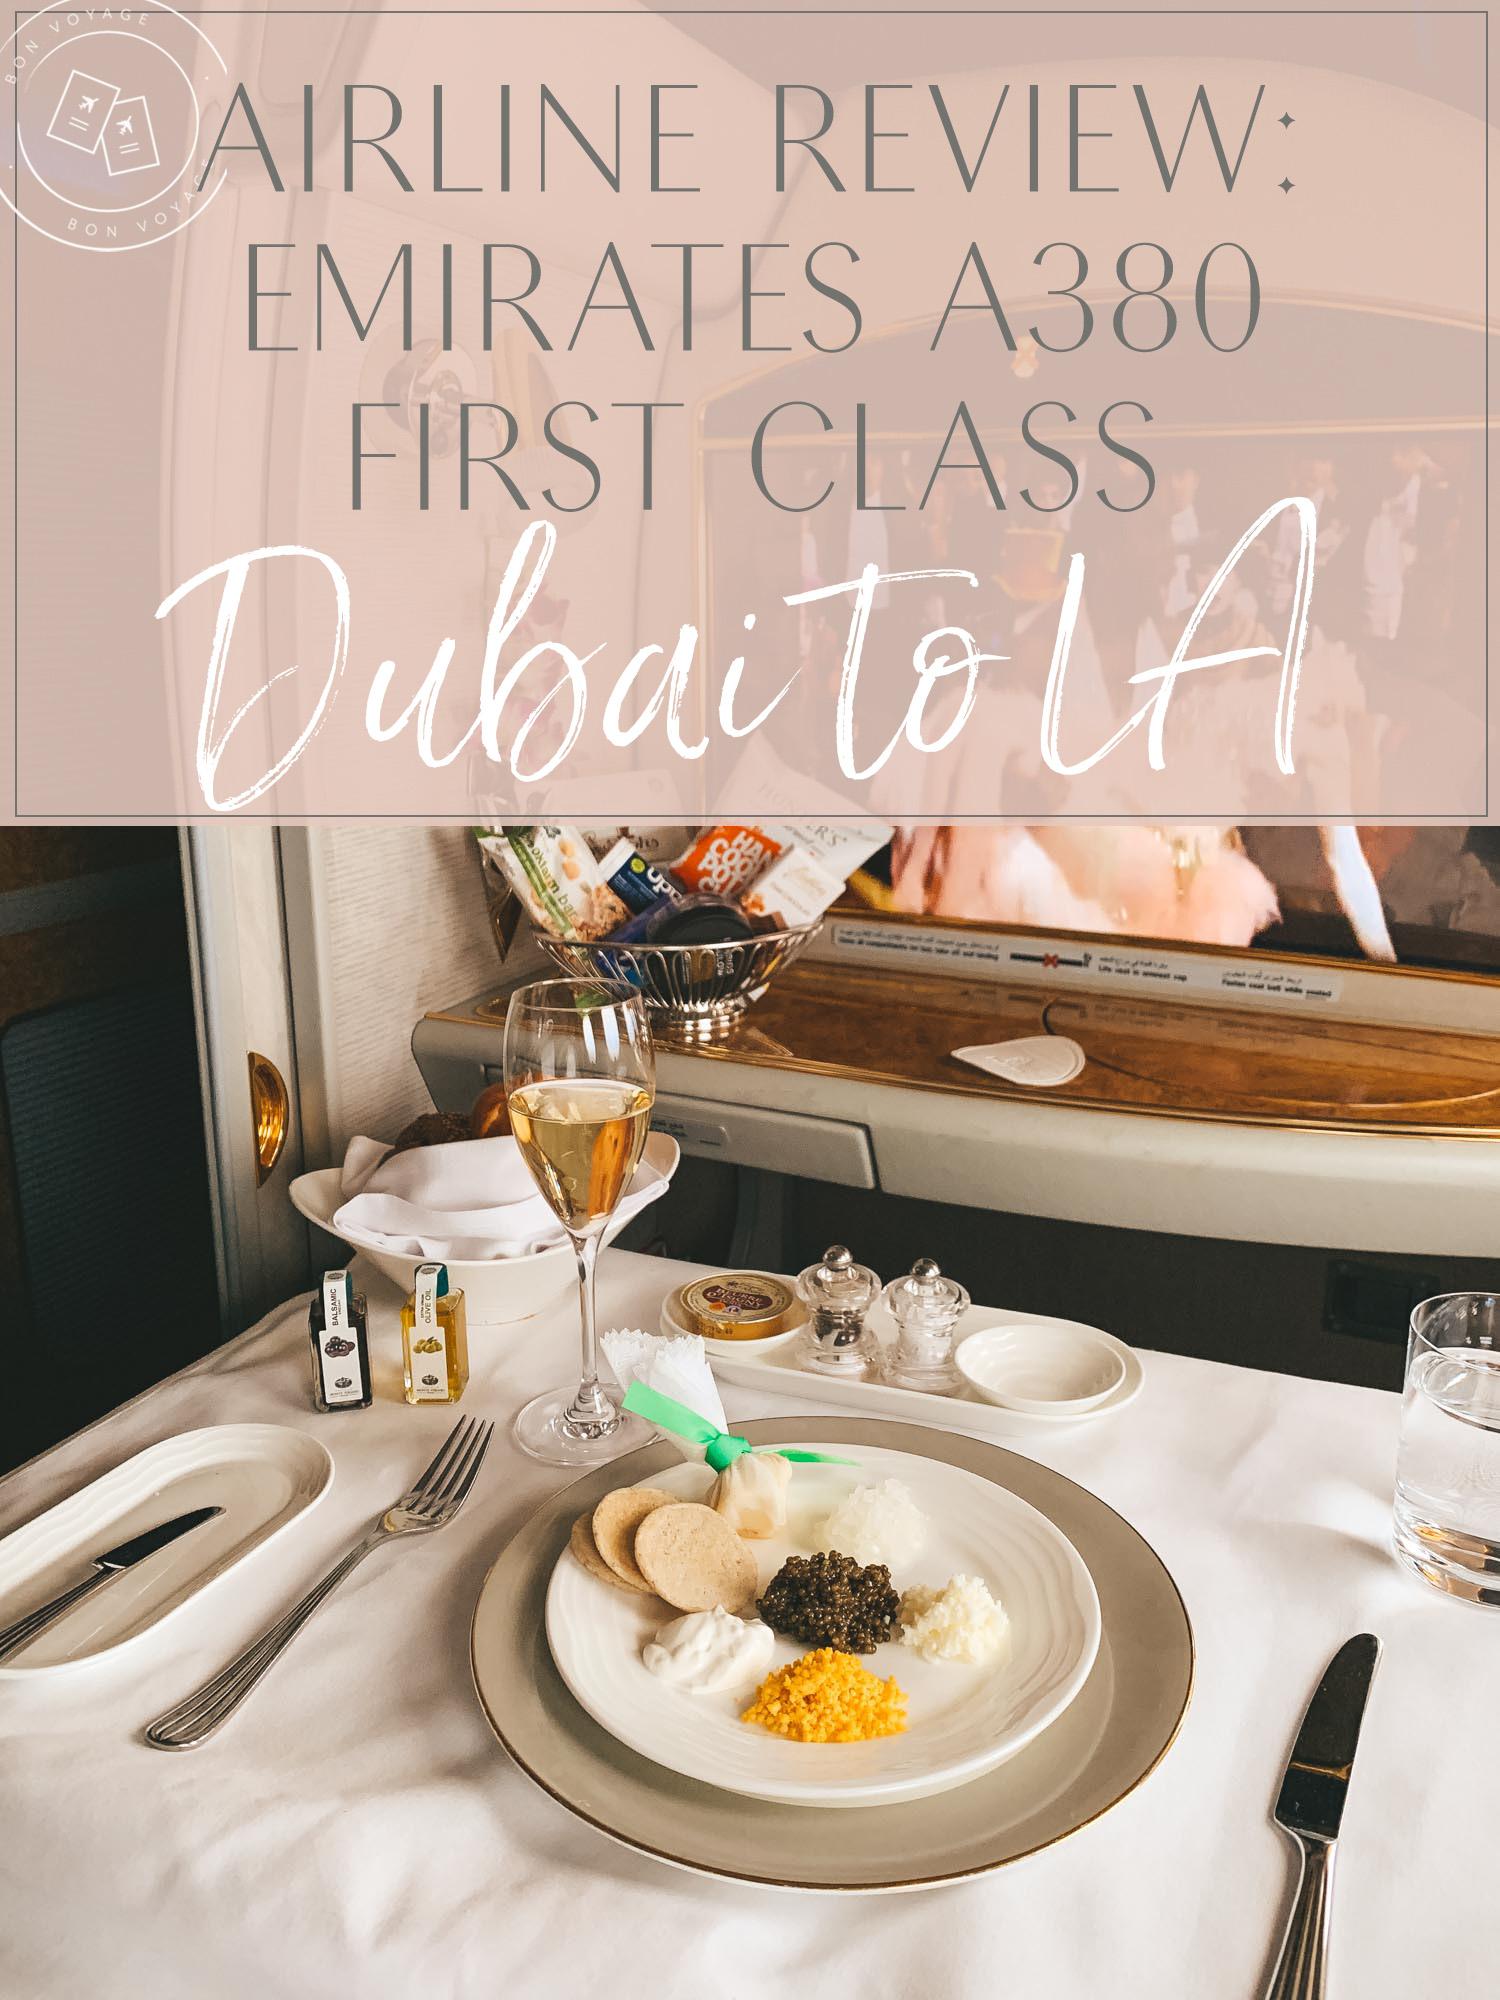 Dubai to LA Emirates Airline Review